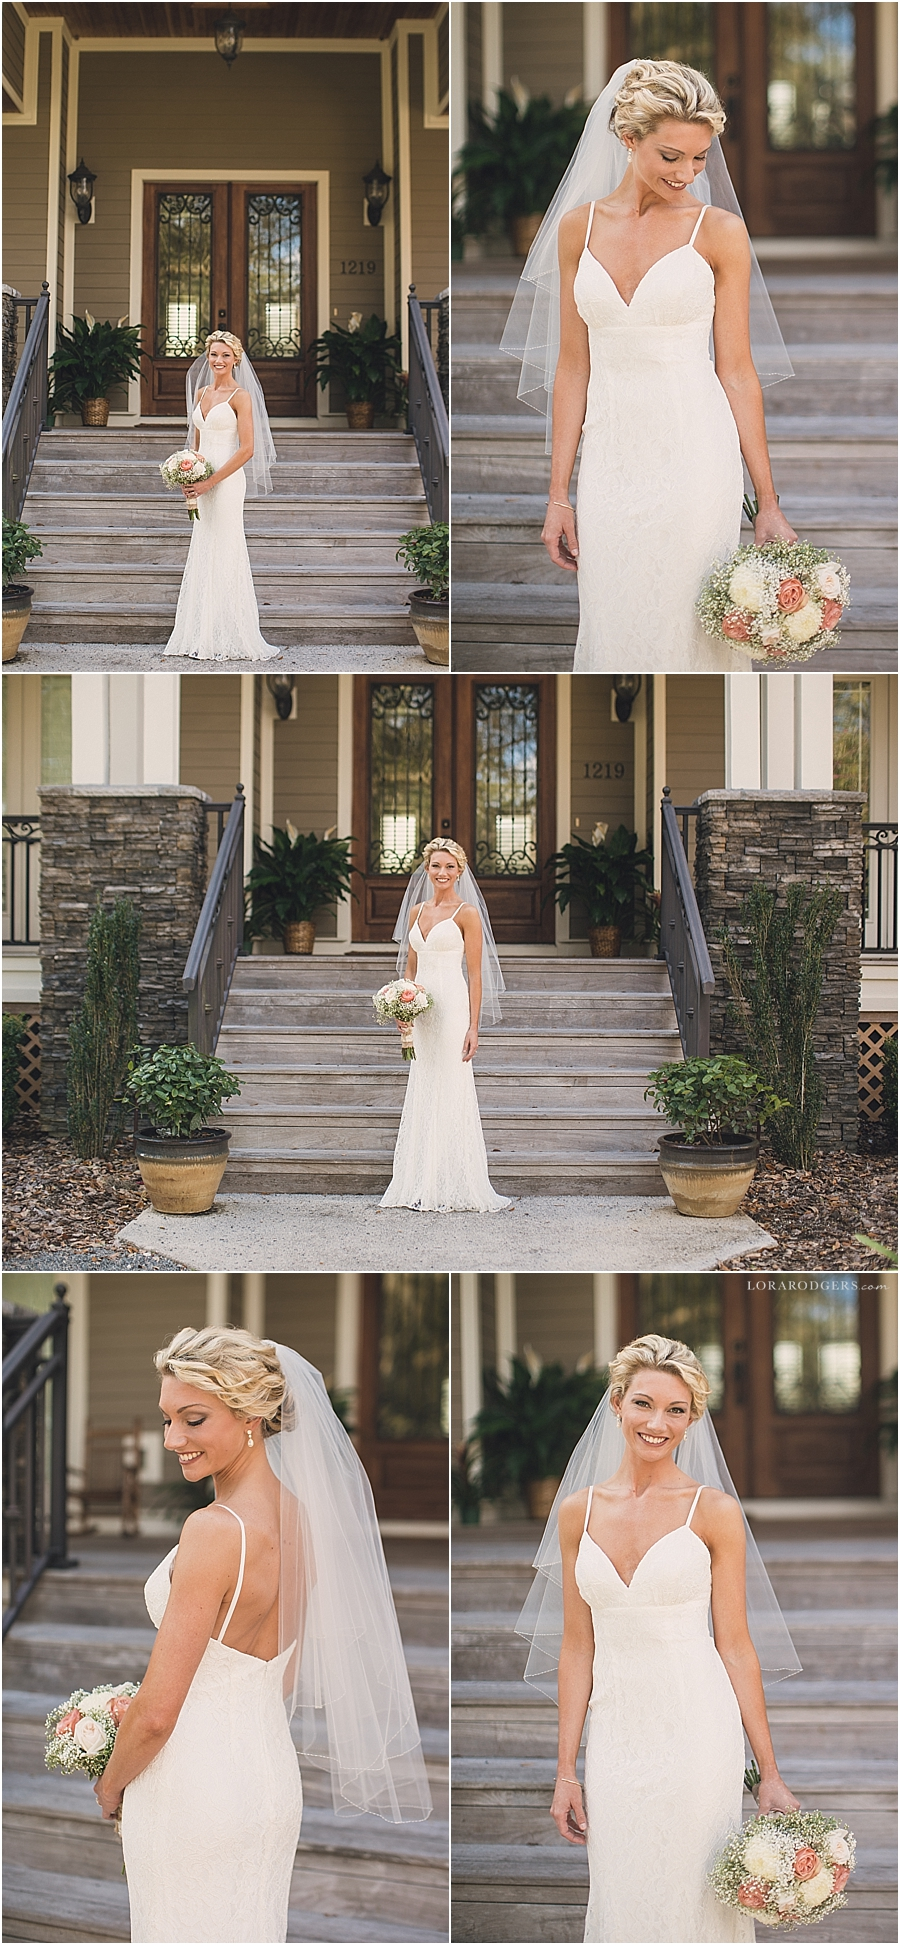 Country_Chic_Ocala_Wedding_003